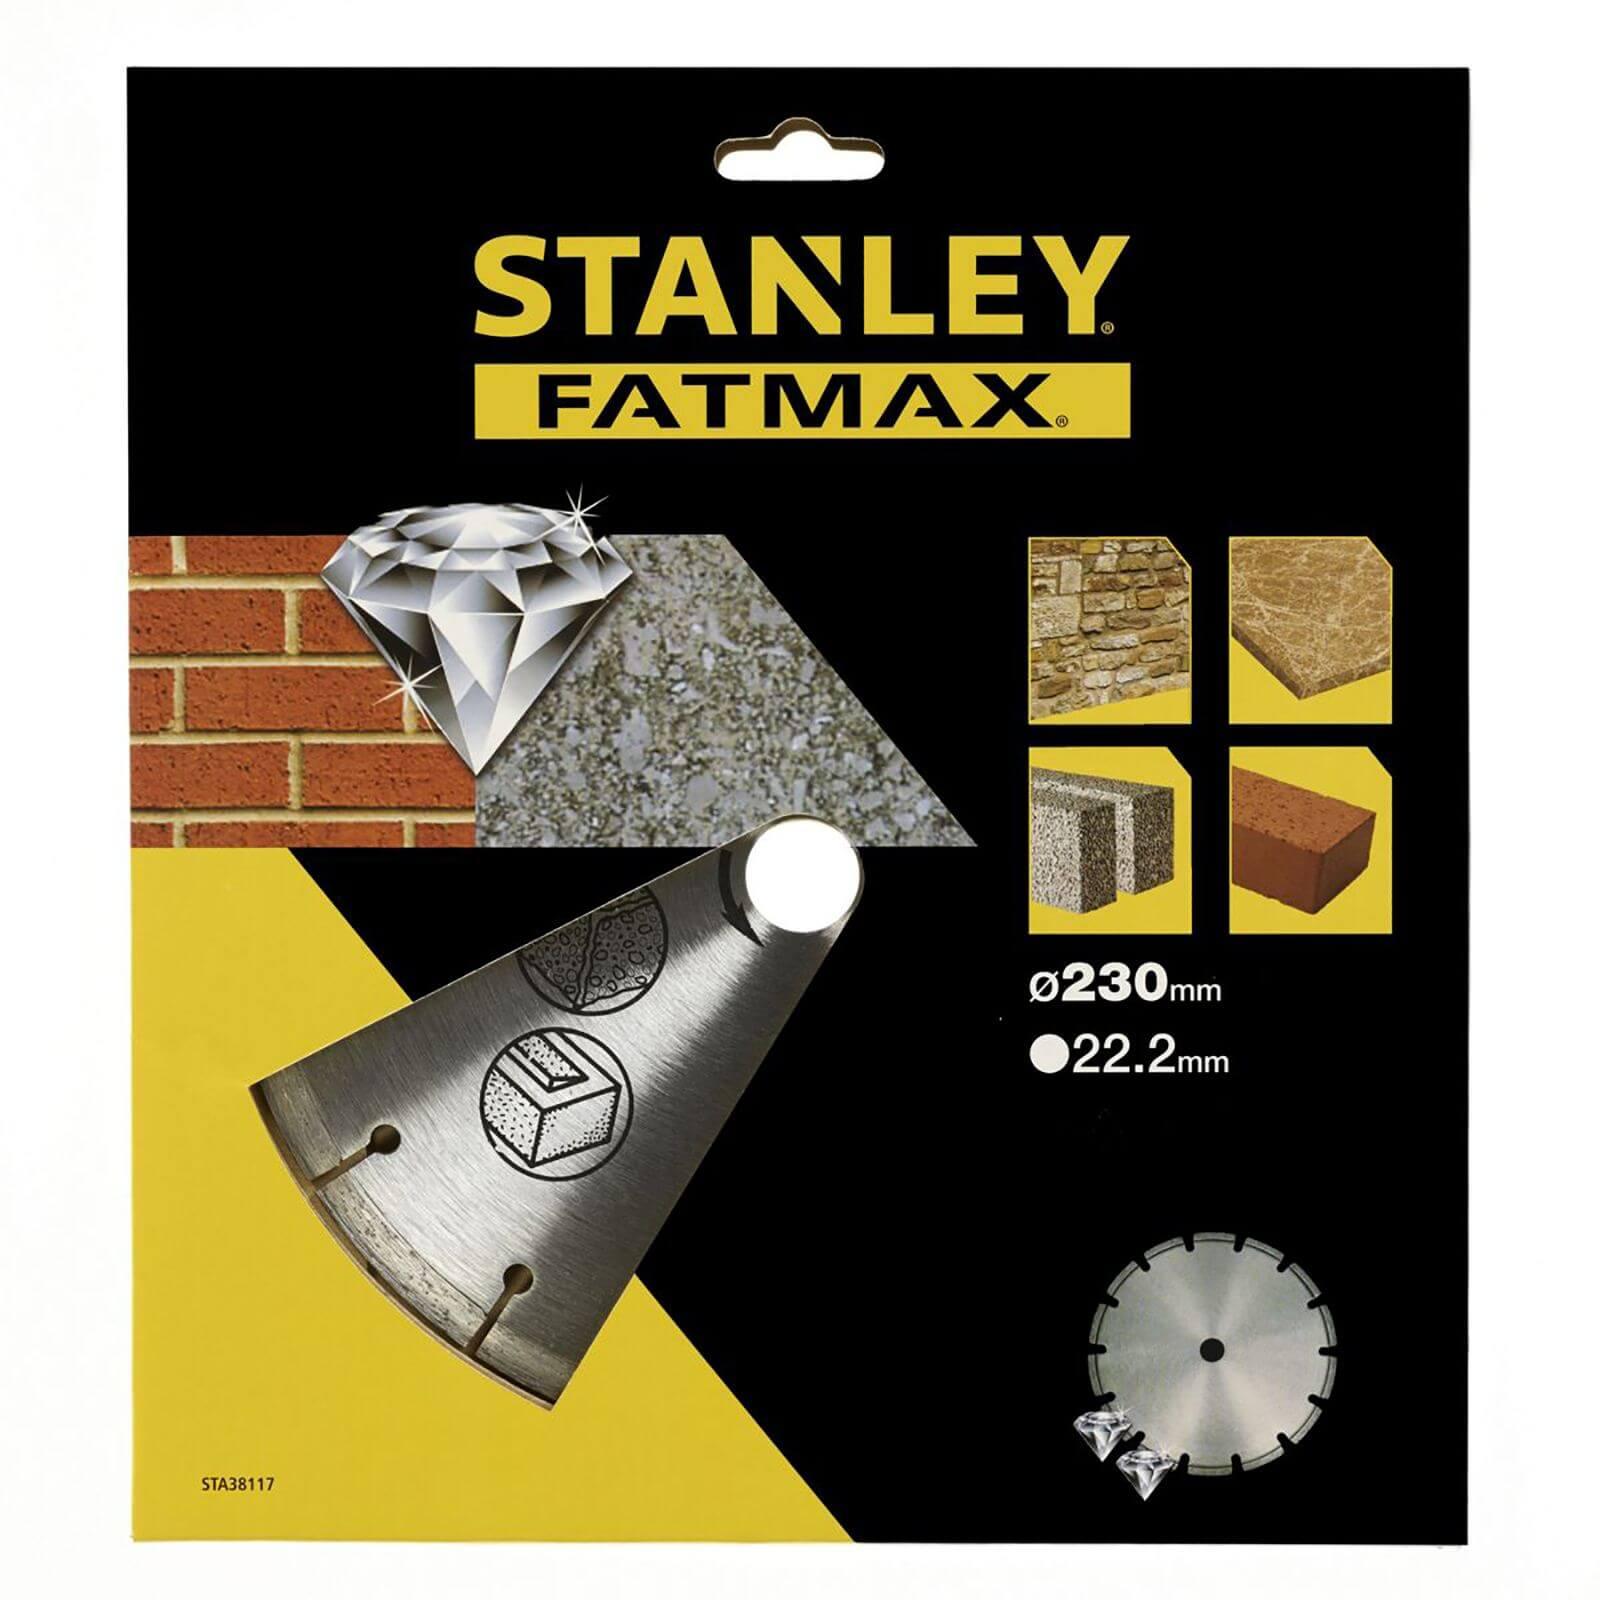 Stanley Fatmax Diamond Disc 230mm Seg Rim - STA38117-XJ